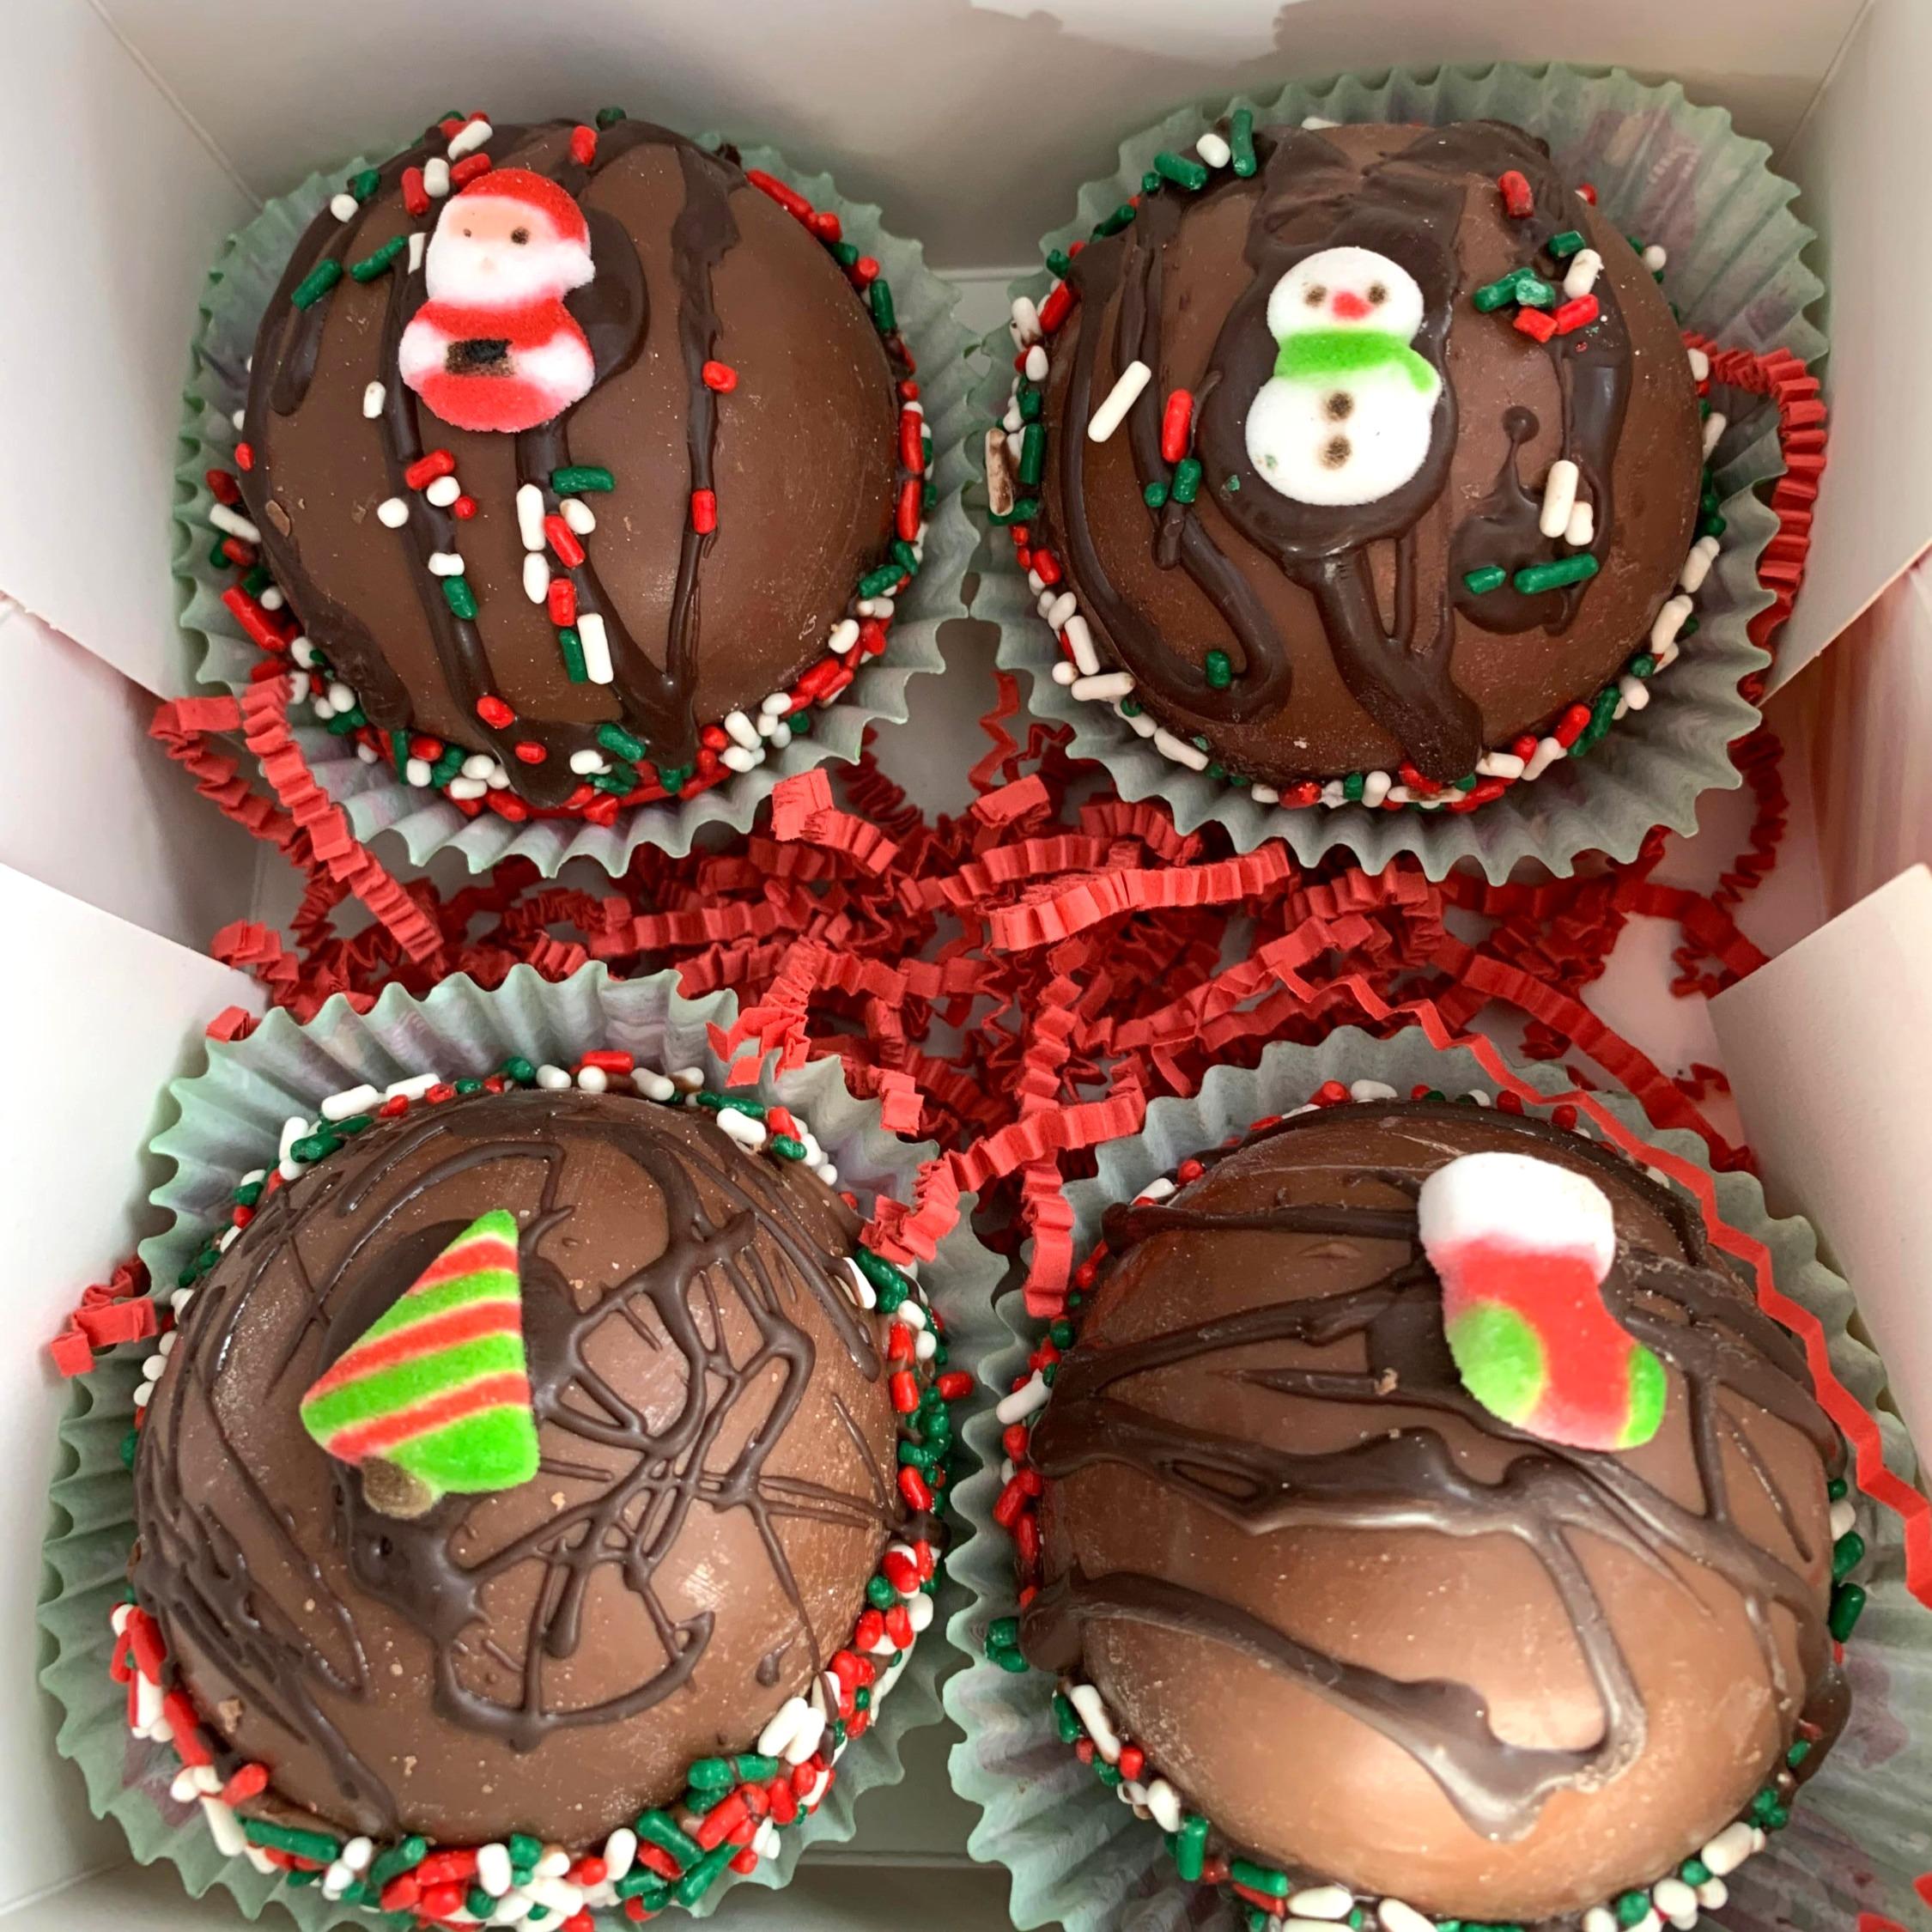 Assortment of Chocolate Bombs